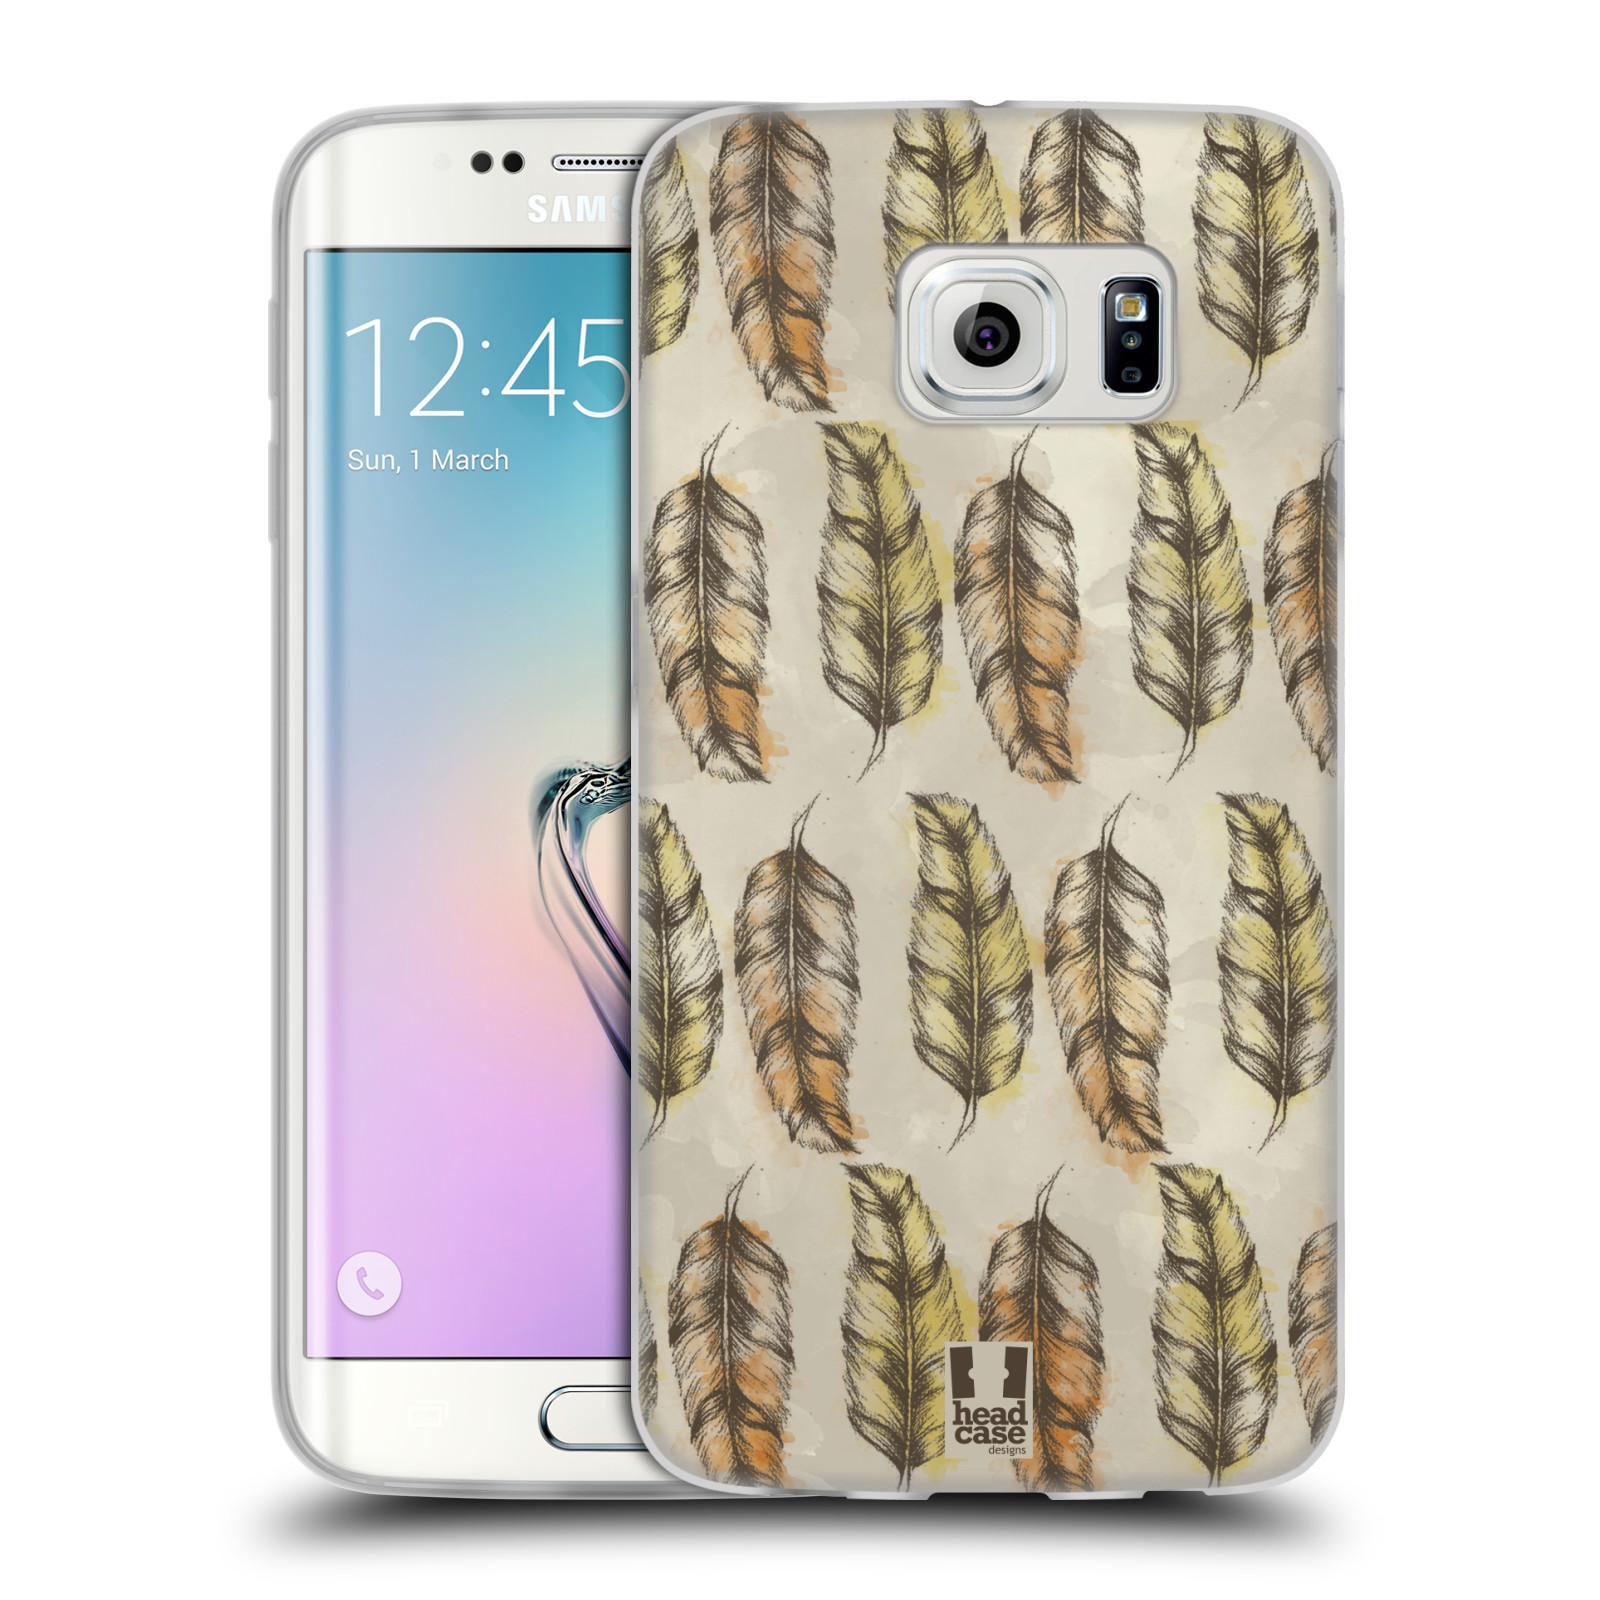 Silikonové pouzdro na mobil Samsung Galaxy S6 Edge - Head Case - Bohémská pírka (Silikonový kryt či obal na mobilní telefon s motivem Bohemian Soul pro Samsung Galaxy S6 Edge SM-G925F)